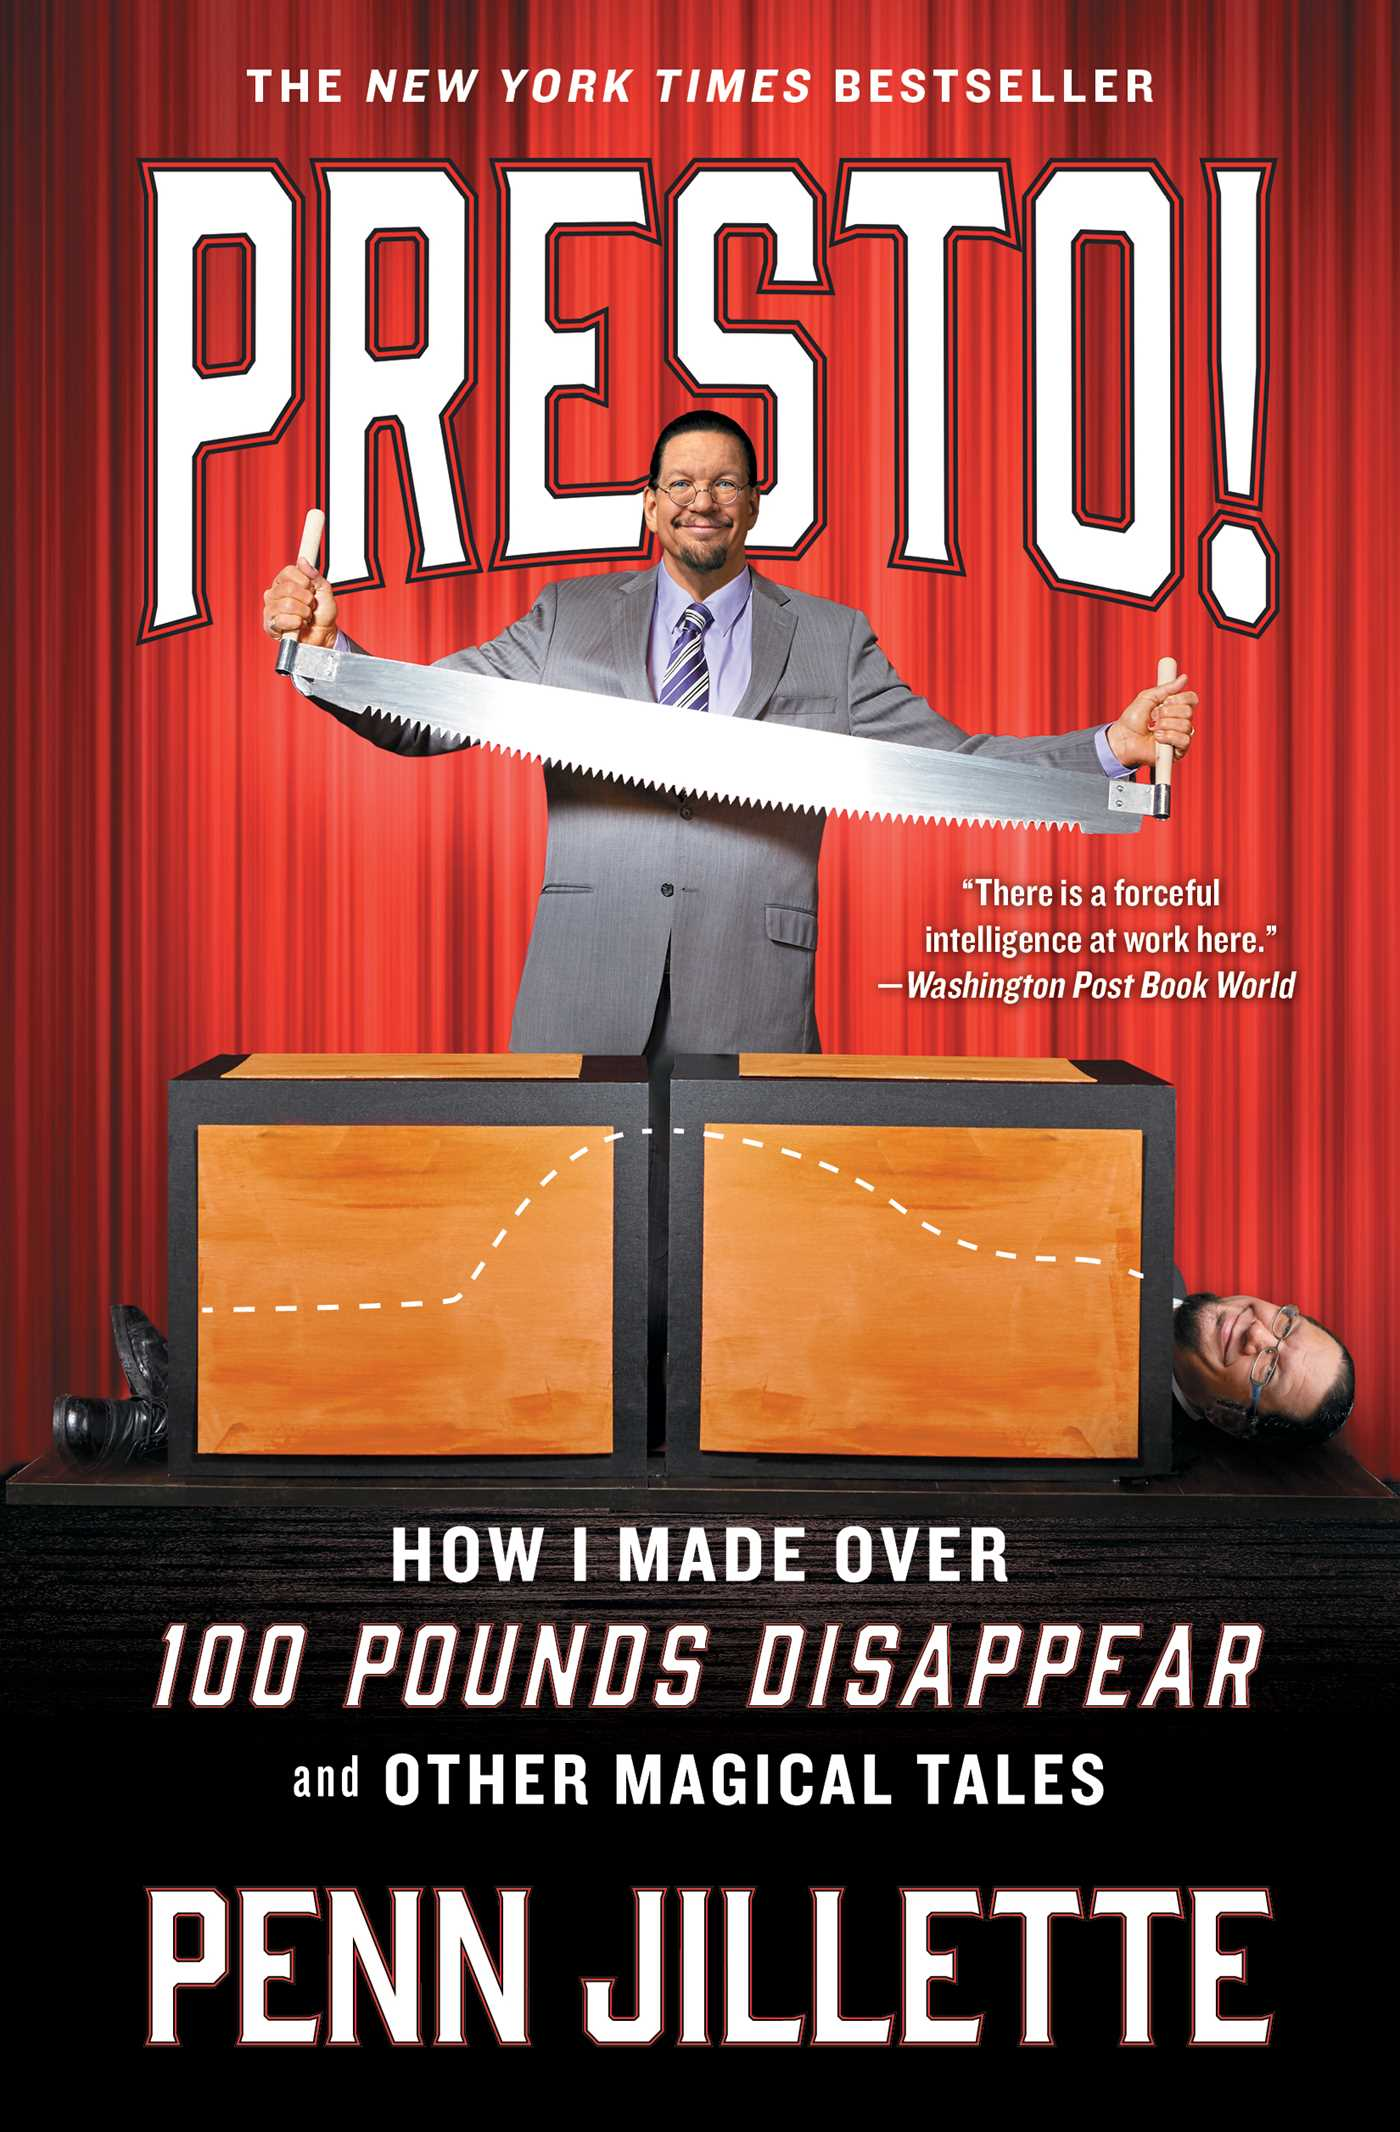 Penn jillette presto book